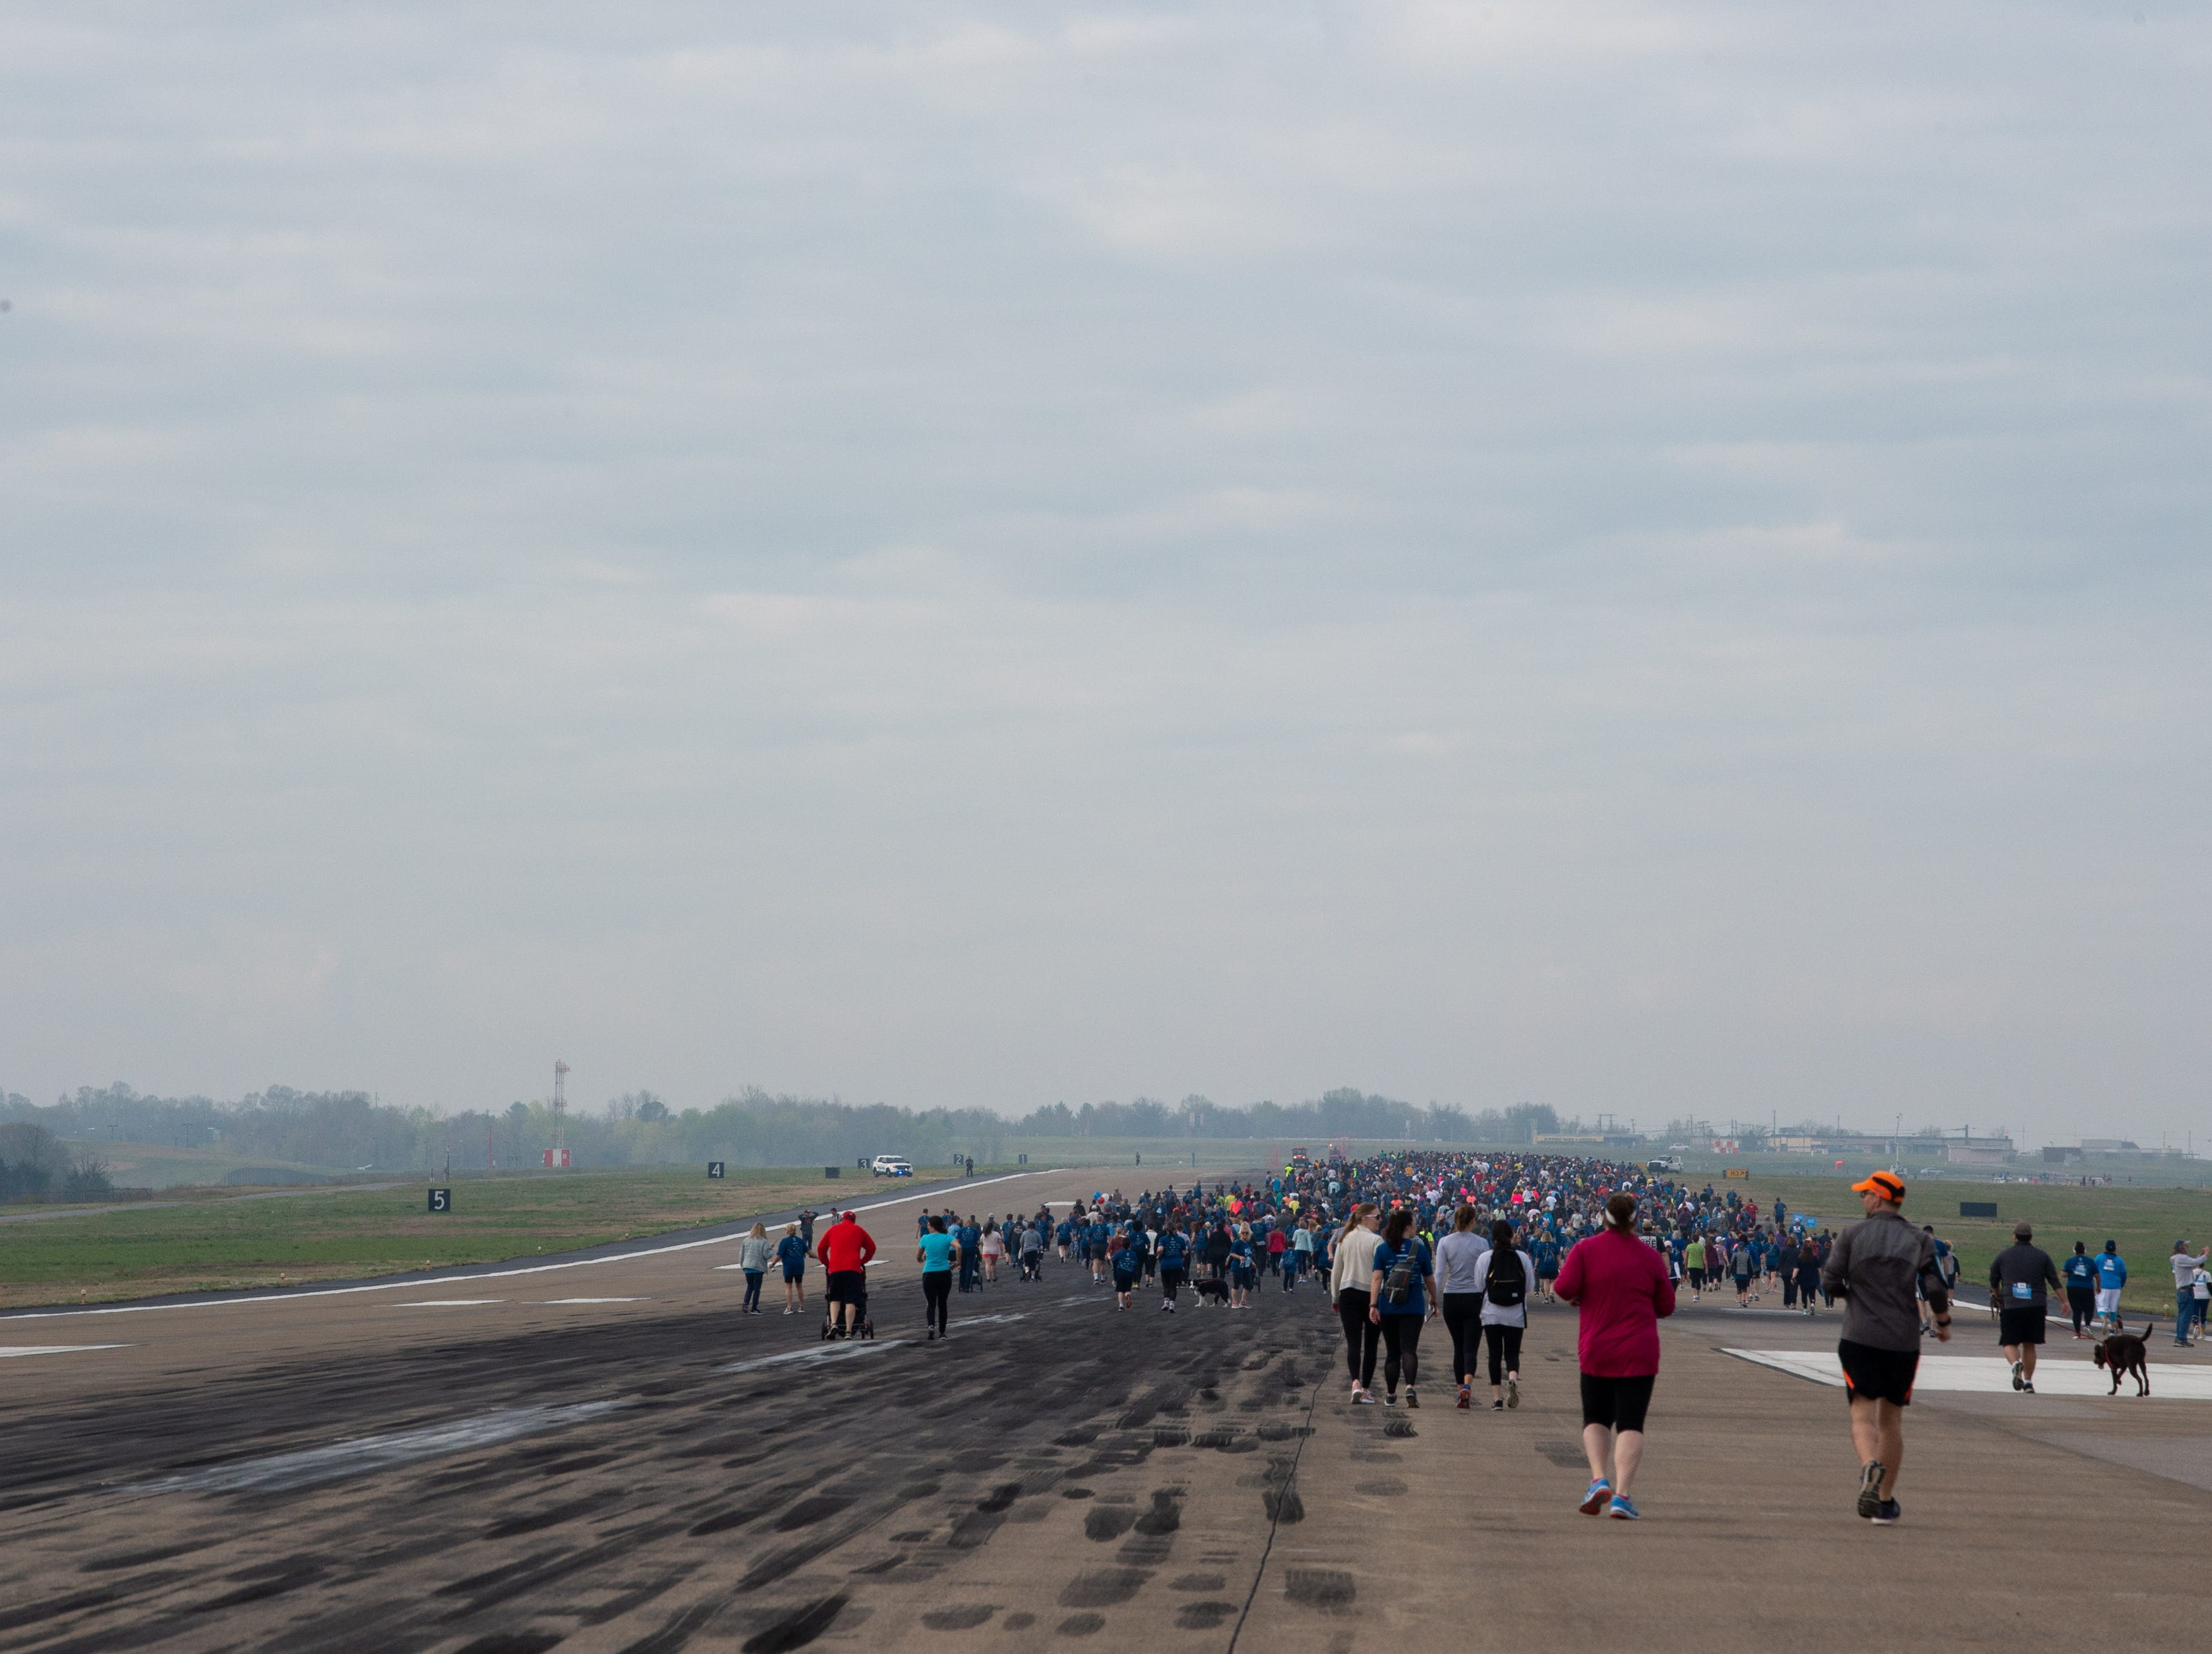 Participants begin the BNA 5K on the Runway at Nashville International Airport on Runway 2R/20L Saturday, April 6, 2019, in Nashville, Tenn.